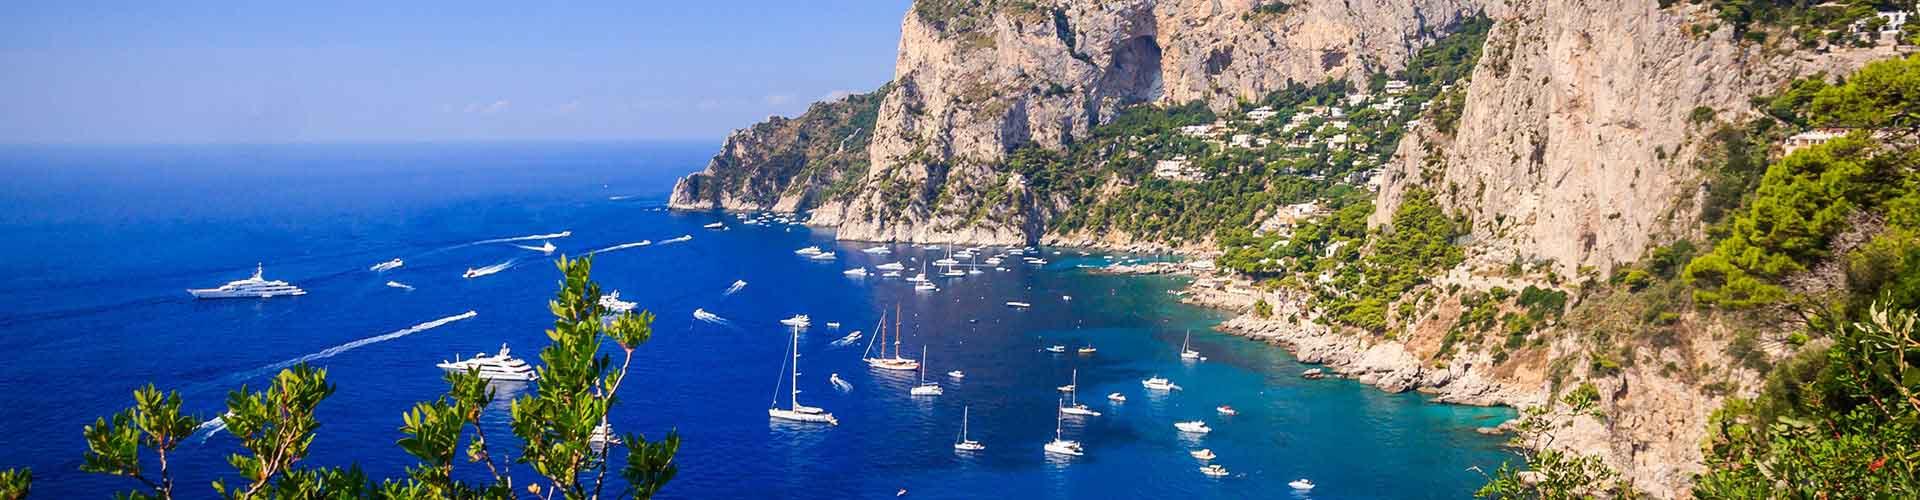 Capri Island – Hostellit kohteessa Capri Island. Capri Island -karttoja, valokuvia ja arvosteluja kaikista Capri Island -hostelleista.